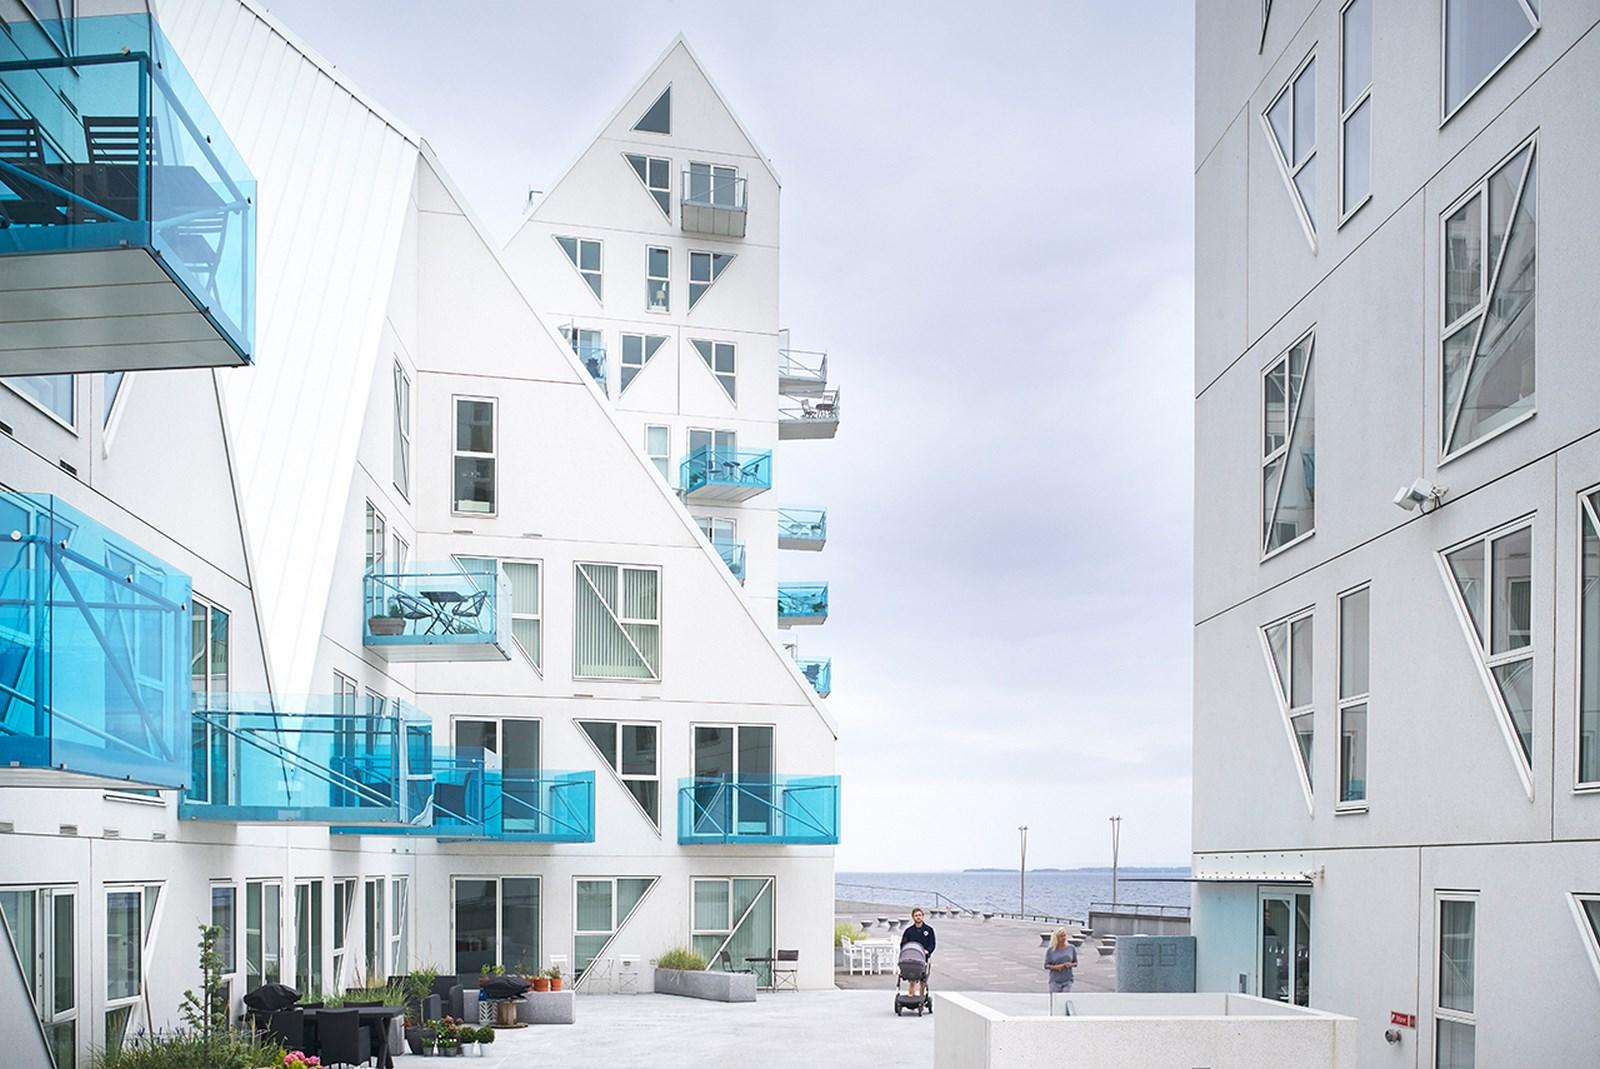 Com_JDS_Iceberg_Aarhus_20150815-1058 (Copy)